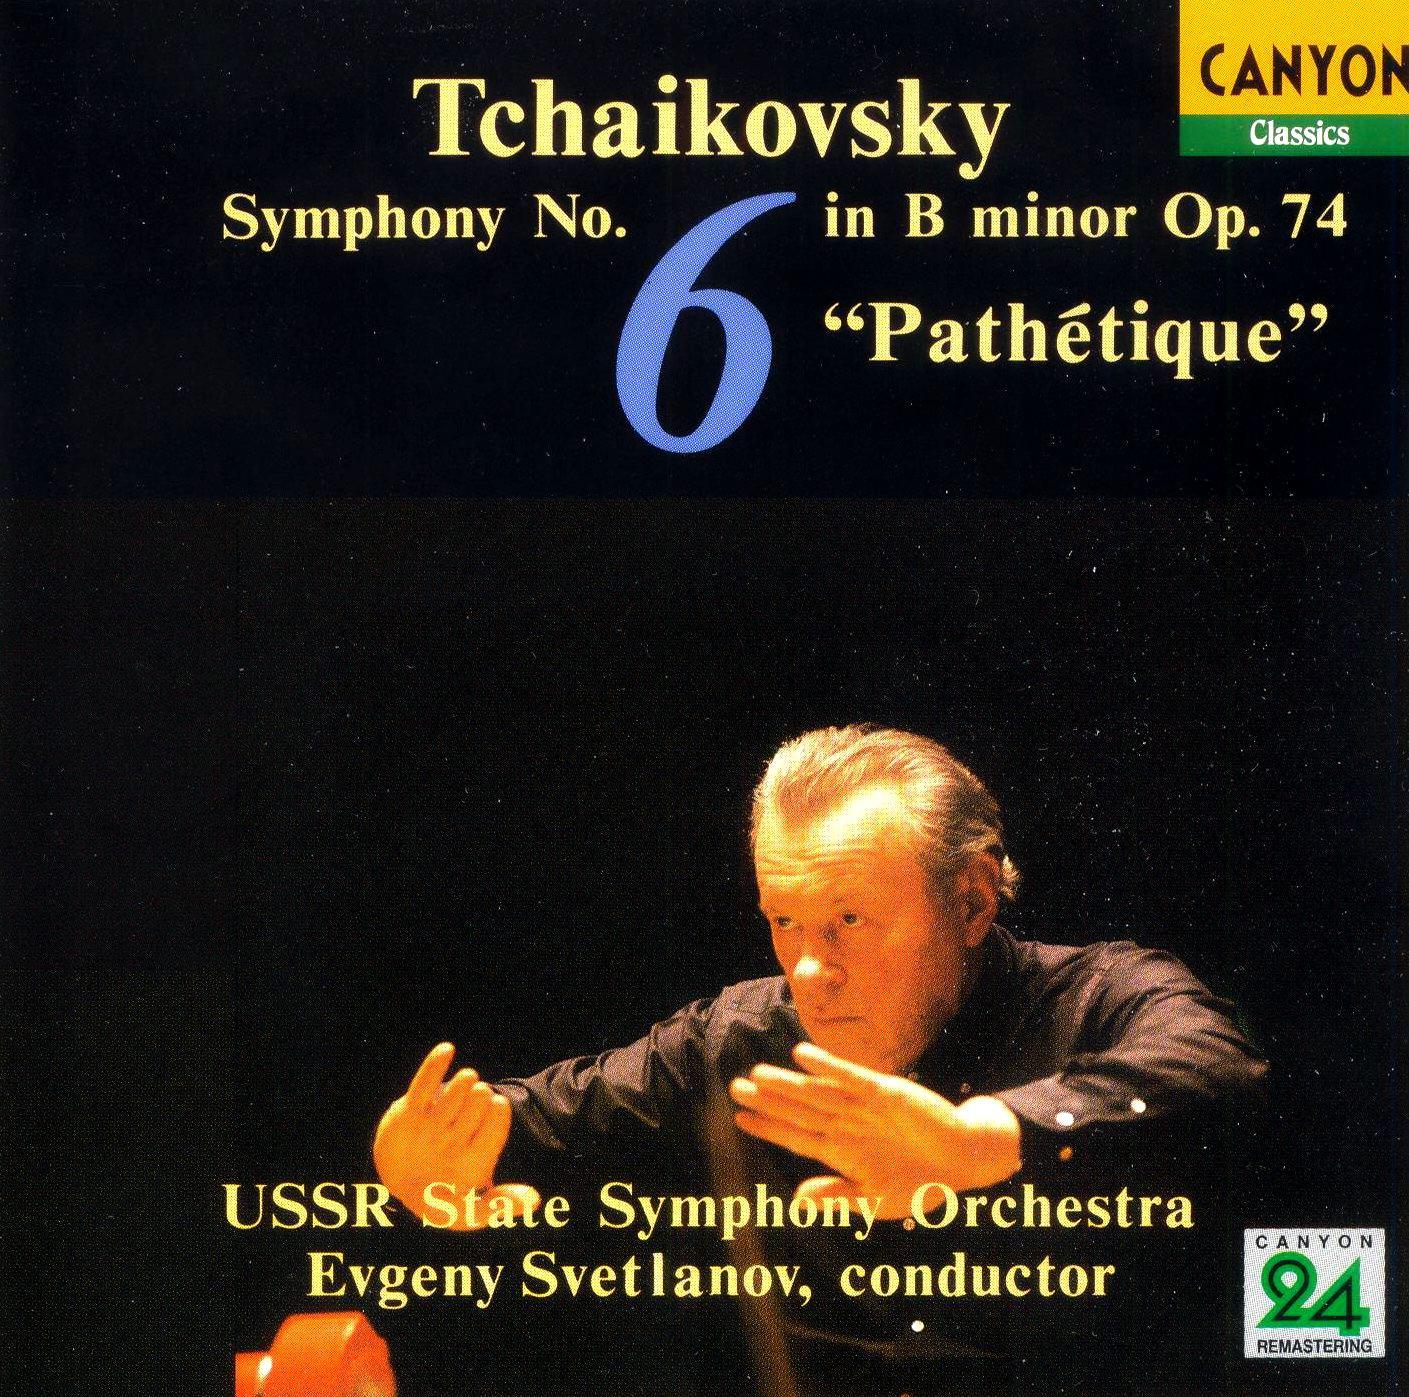 tchaikovsky symphony 6 essay Tchaikovsky: symphony no 6 & dvořák  the main work on this latest release is tchaikovsky's symphony no 6 in b minor and in an engrossing twelve page essay in.